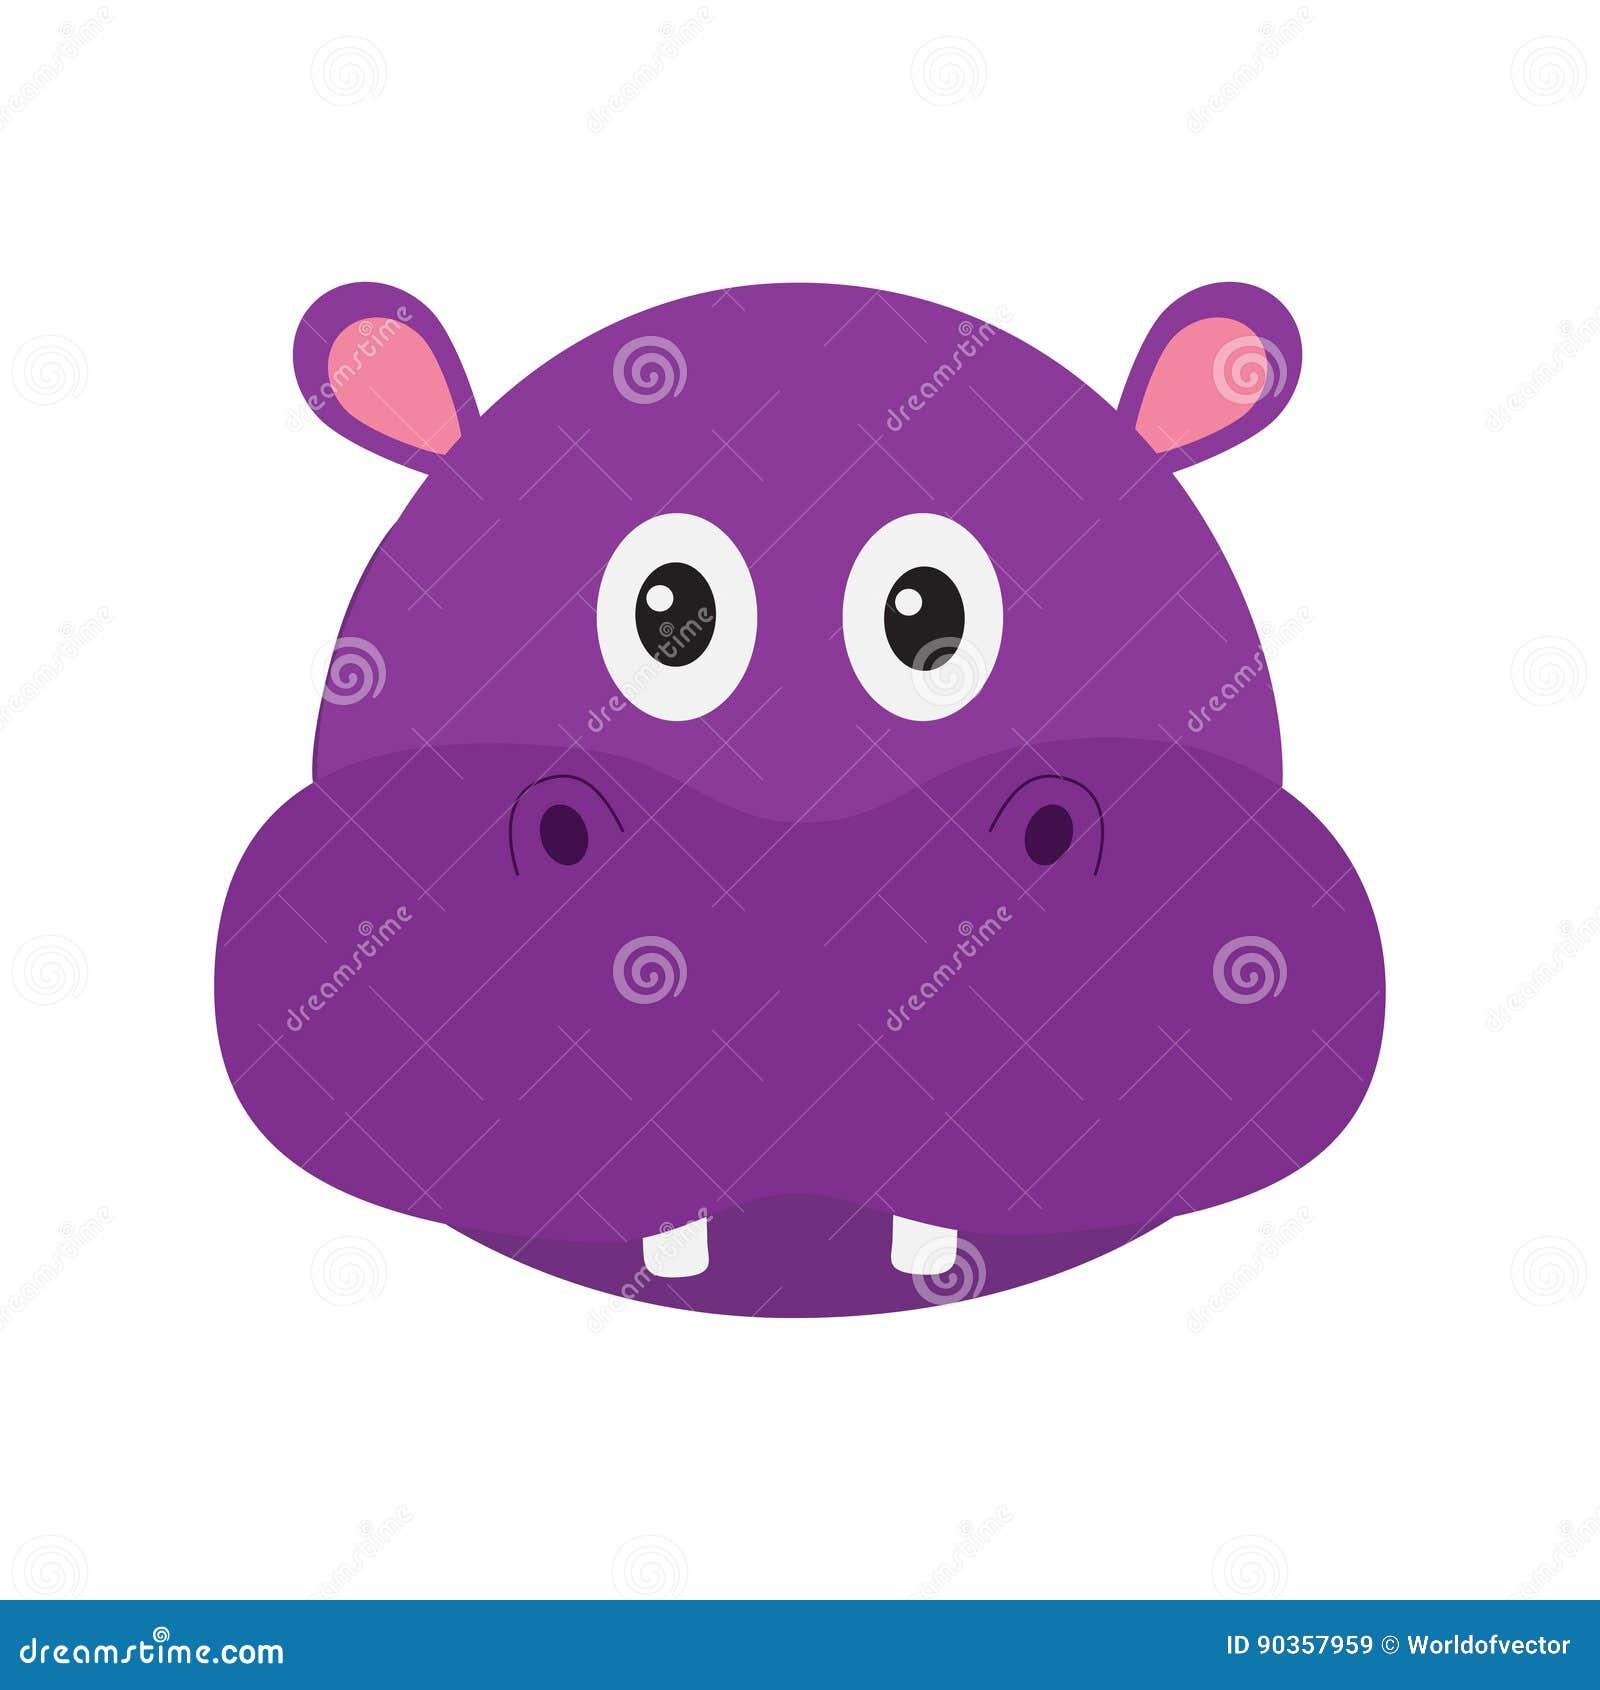 Gape Cartoons, Illustrations & Vector Stock Images - 88 ... Hippopotamus Eating People